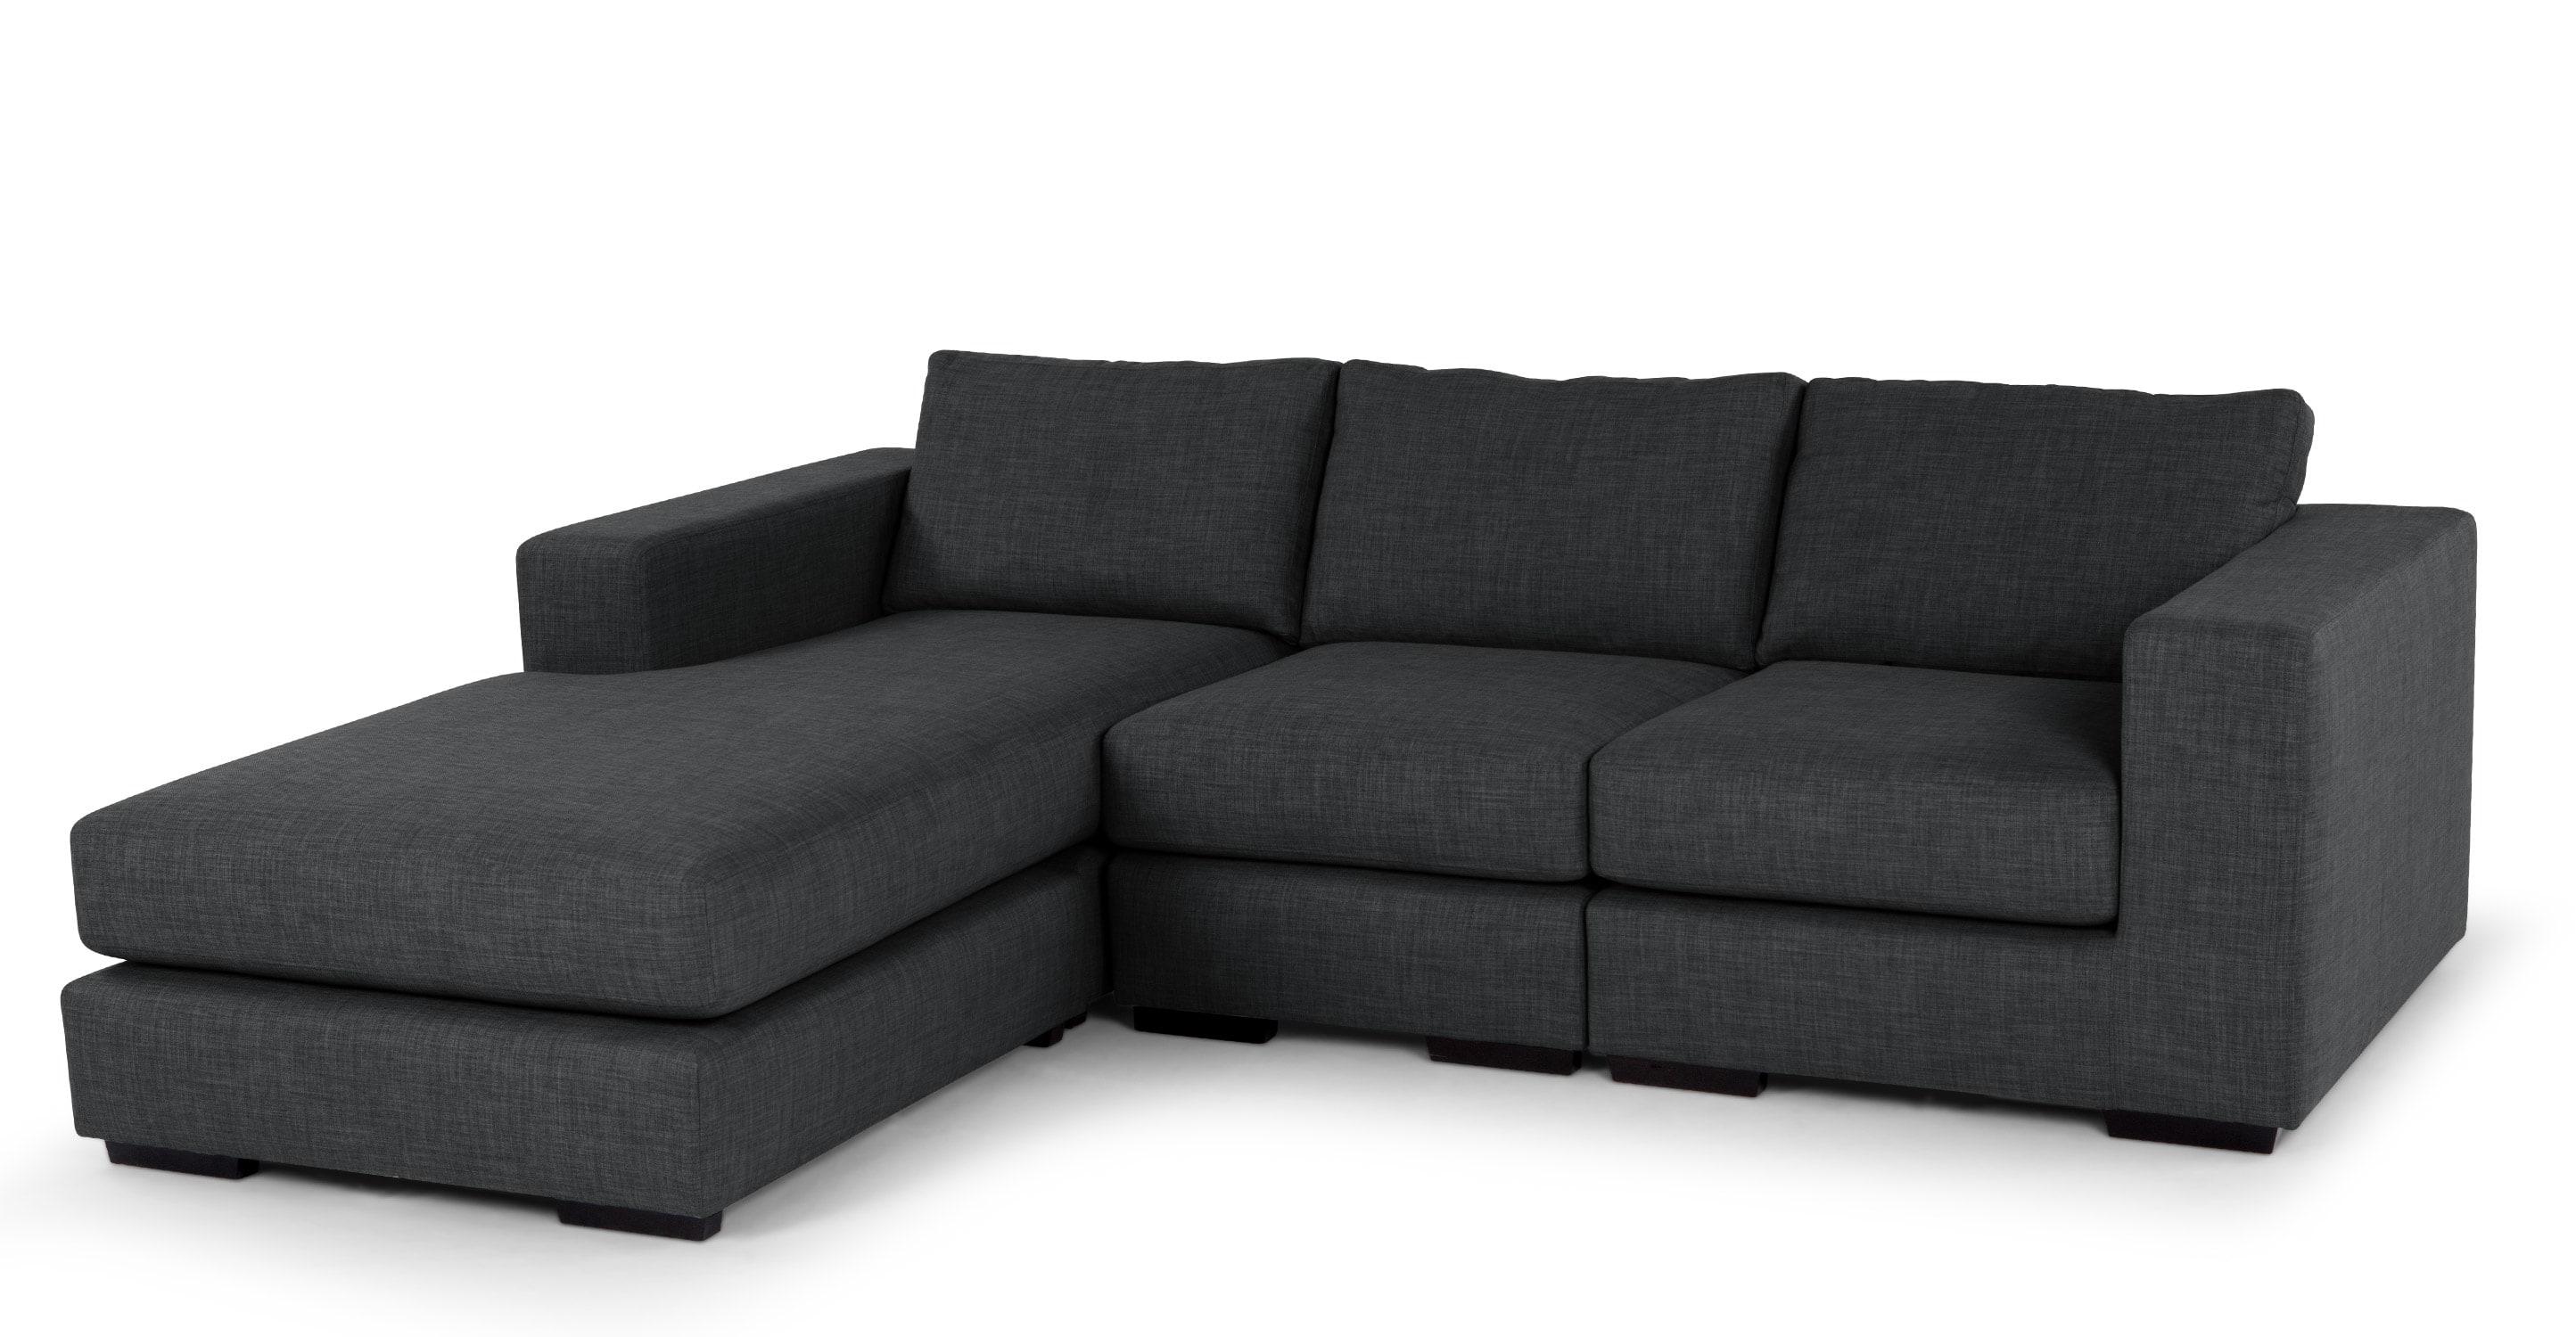 Modular Corner Sofa Hereo Sofa For Modular Corner Sofas (Image 7 of 15)